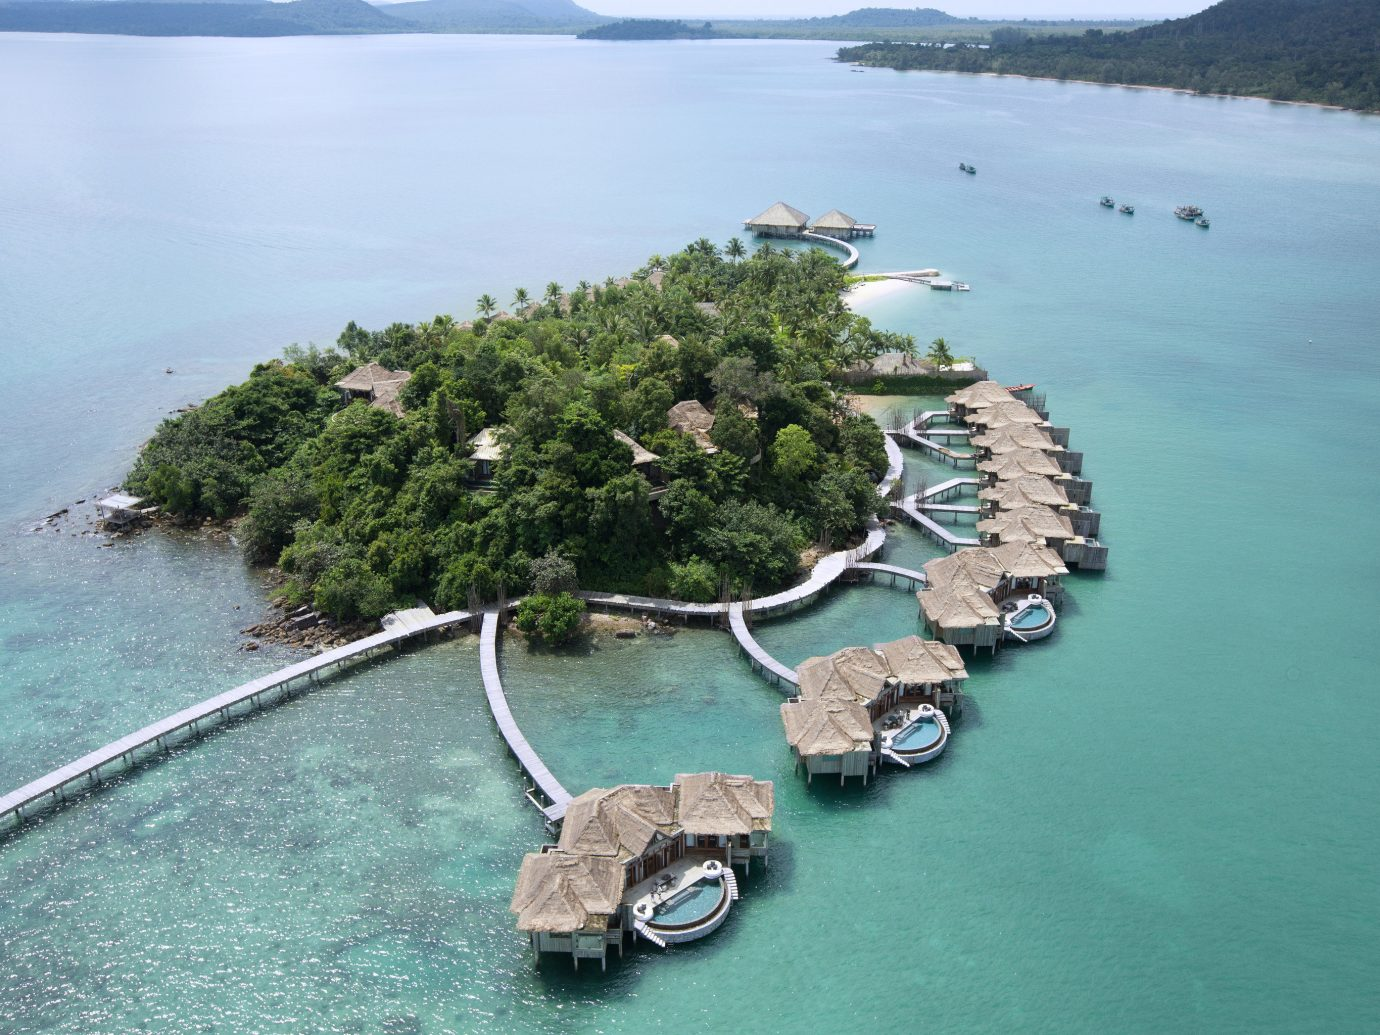 Hotels Trip Ideas water landform Nature Sea Coast Lake shore Beach archipelago bay aerial photography islet Island vehicle cape terrain pond tied